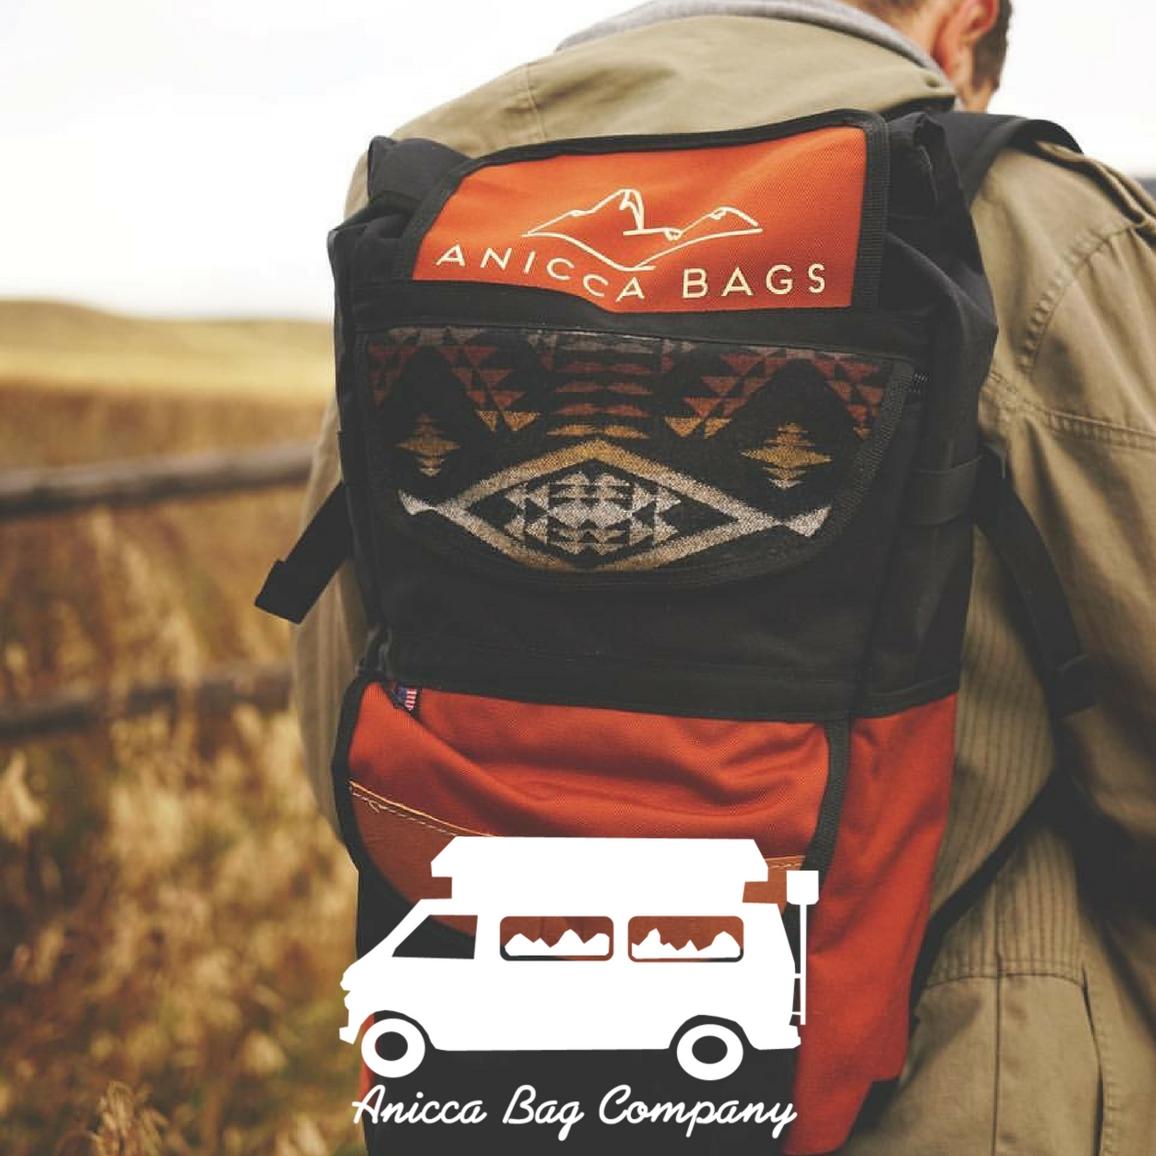 Anicca Bags Brand Image.jpg